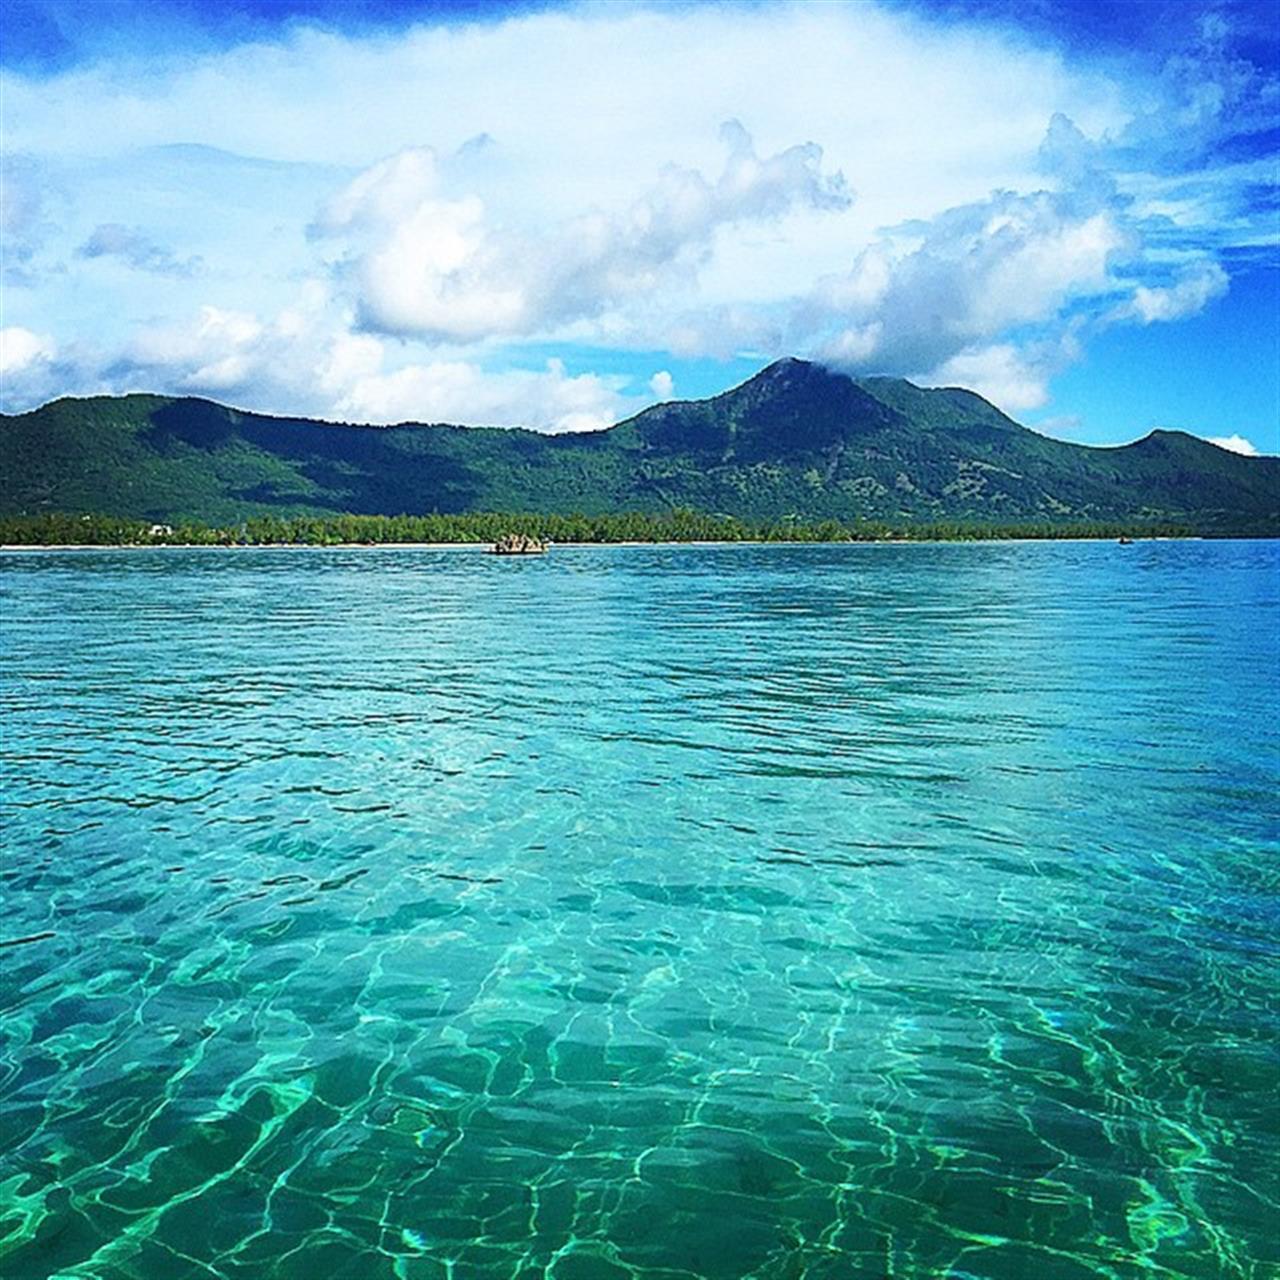 #lagoon #mauritius #LeadingRelocal